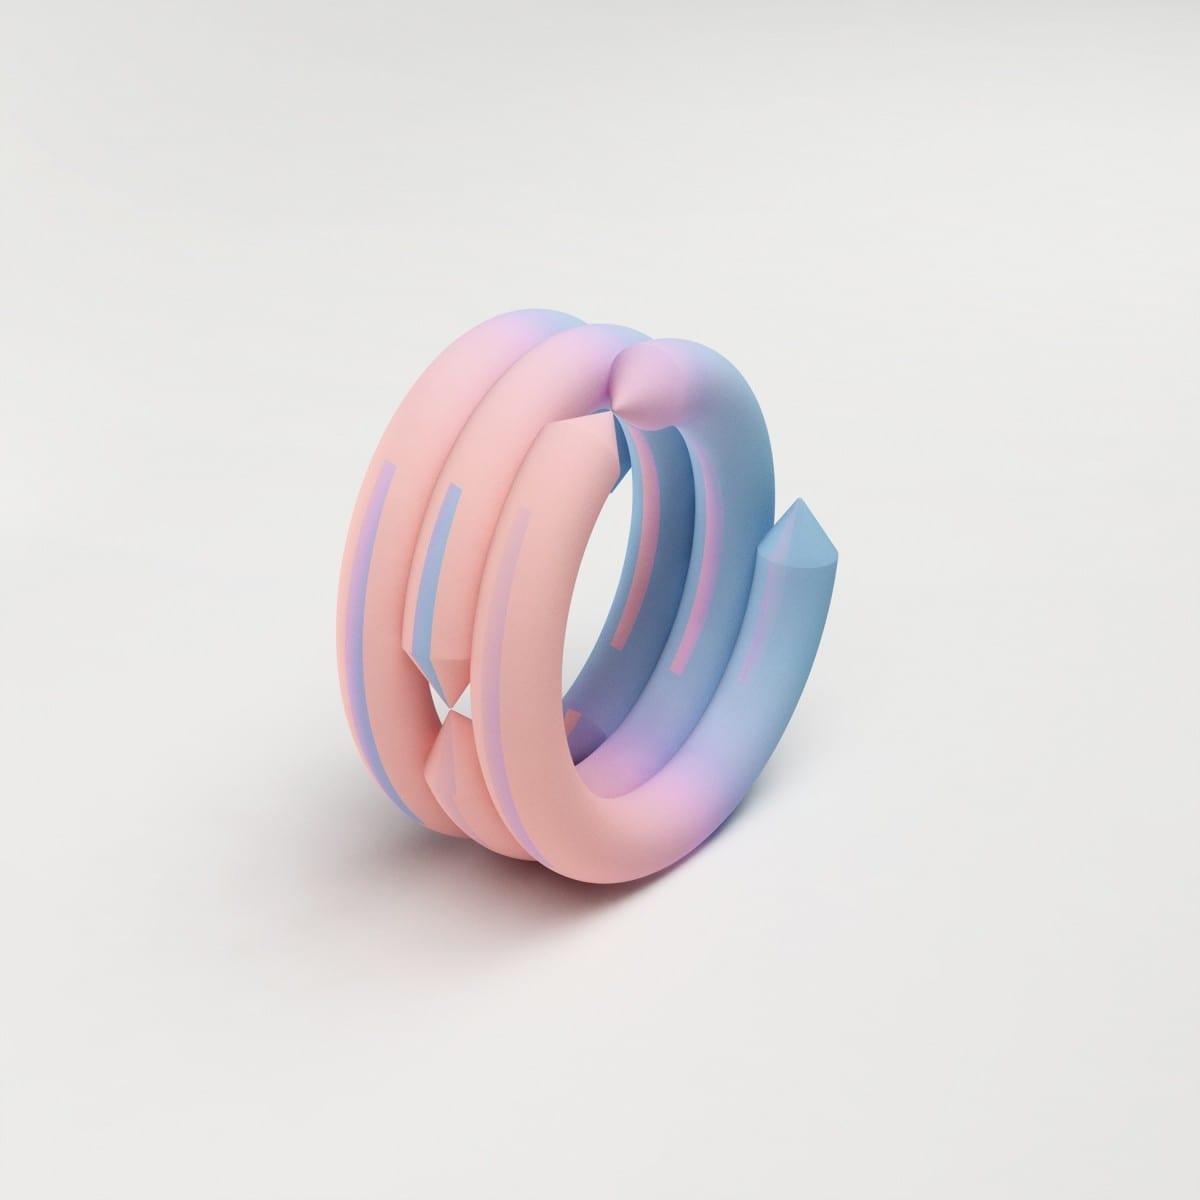 Maiko Gubler, Gradient Bangles, Cone, digital model/ dimensions variable, 2013